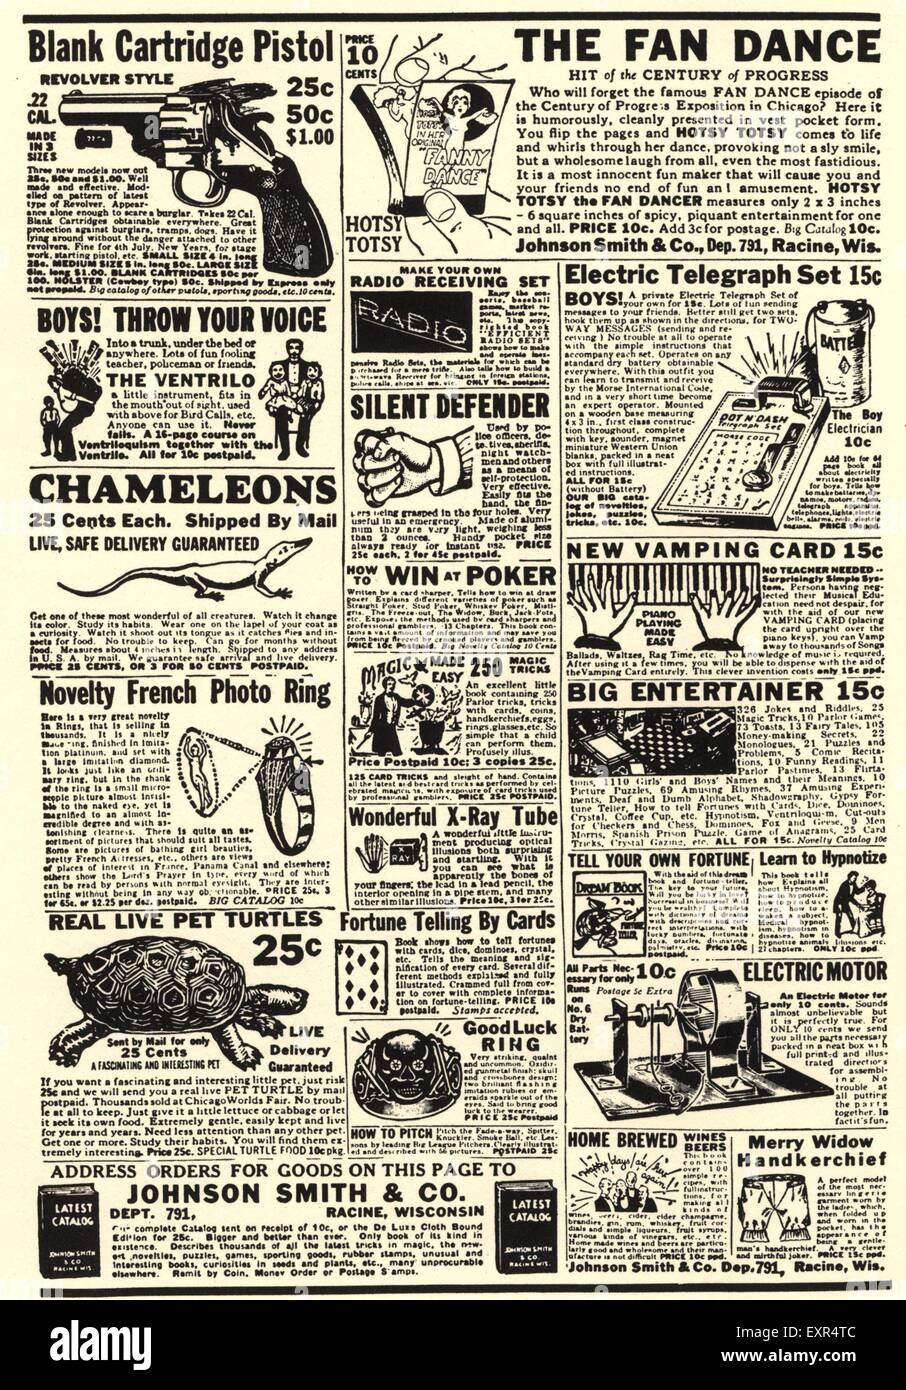 1950s USA Small adverts Magazine Plate - Stock Image